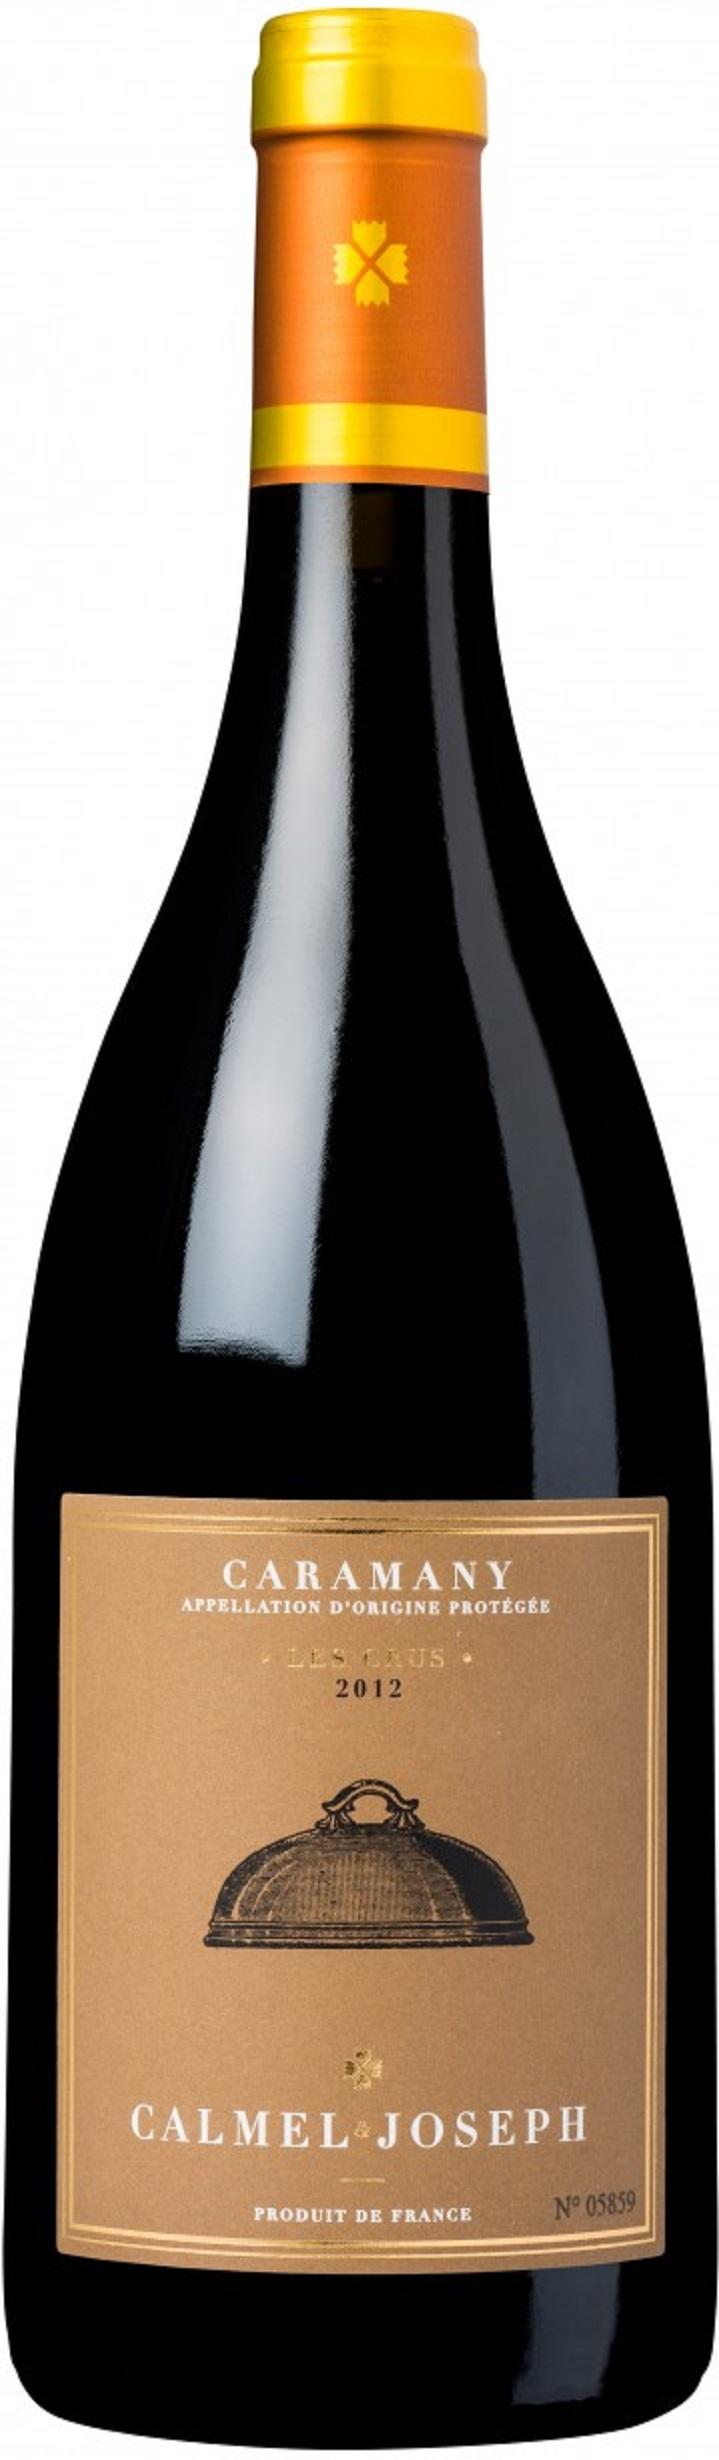 Calmel & Joseph Caramany-2012